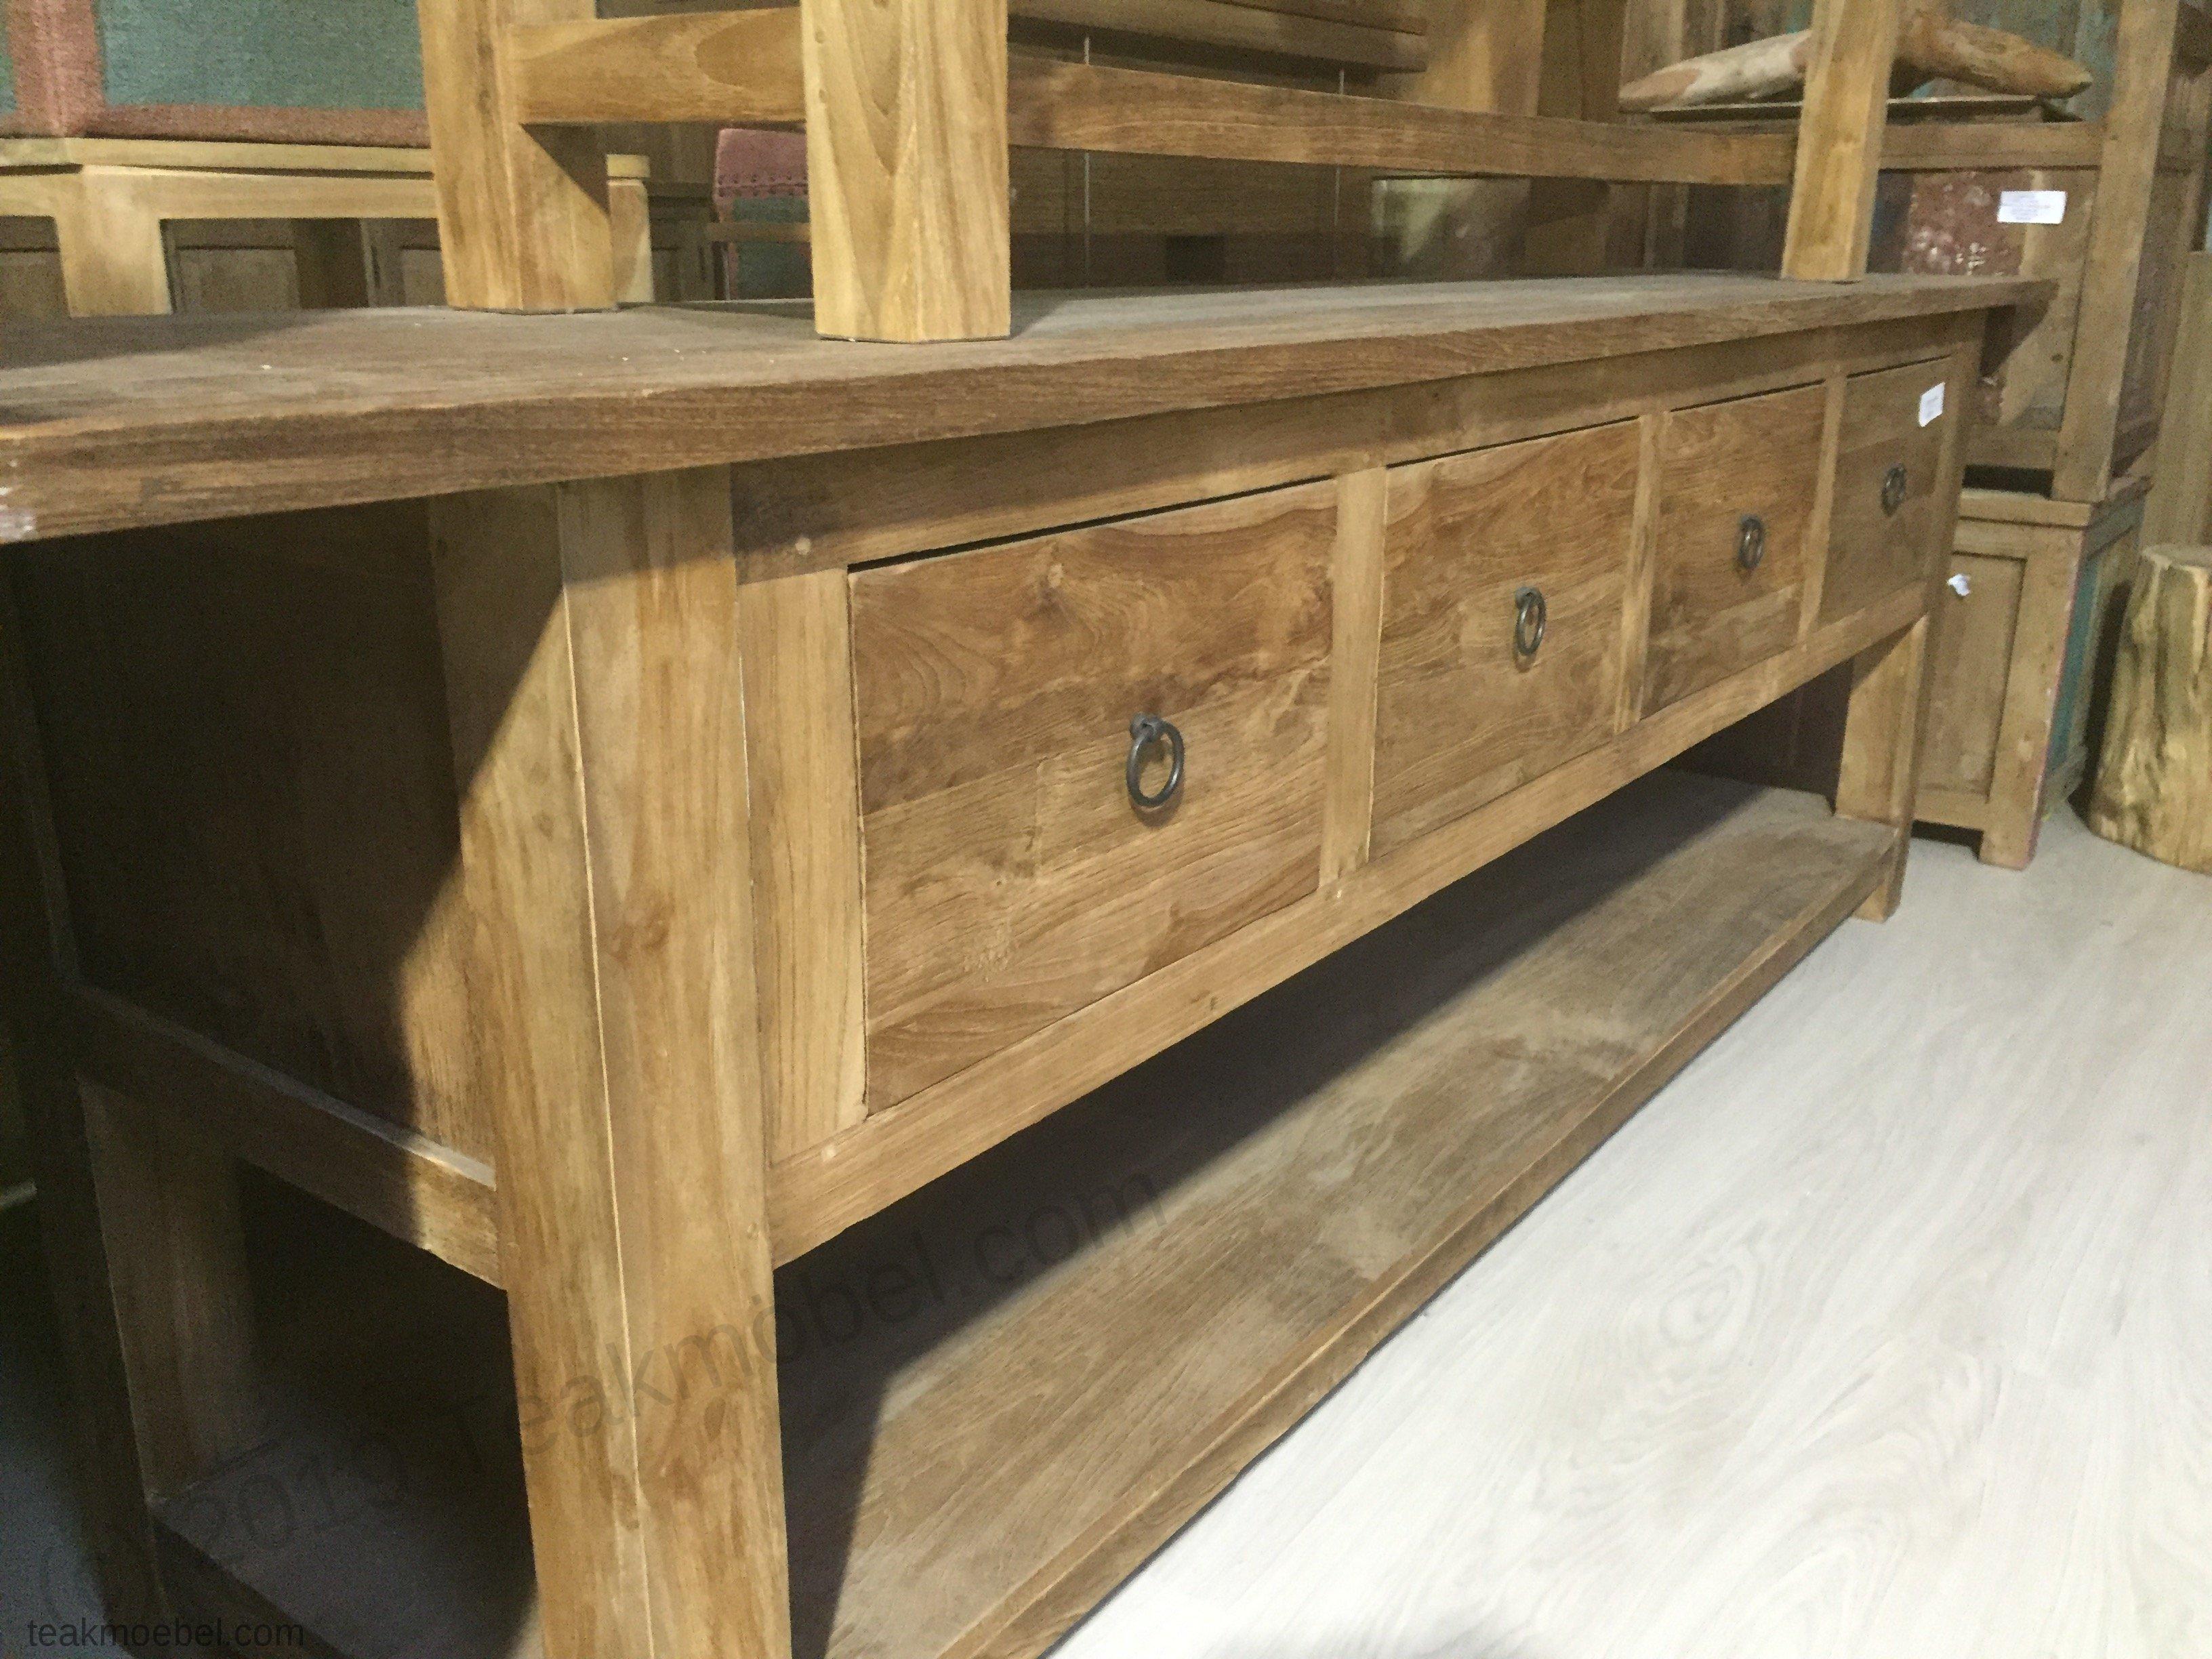 teak anrichte 250x55x79cm teakm. Black Bedroom Furniture Sets. Home Design Ideas